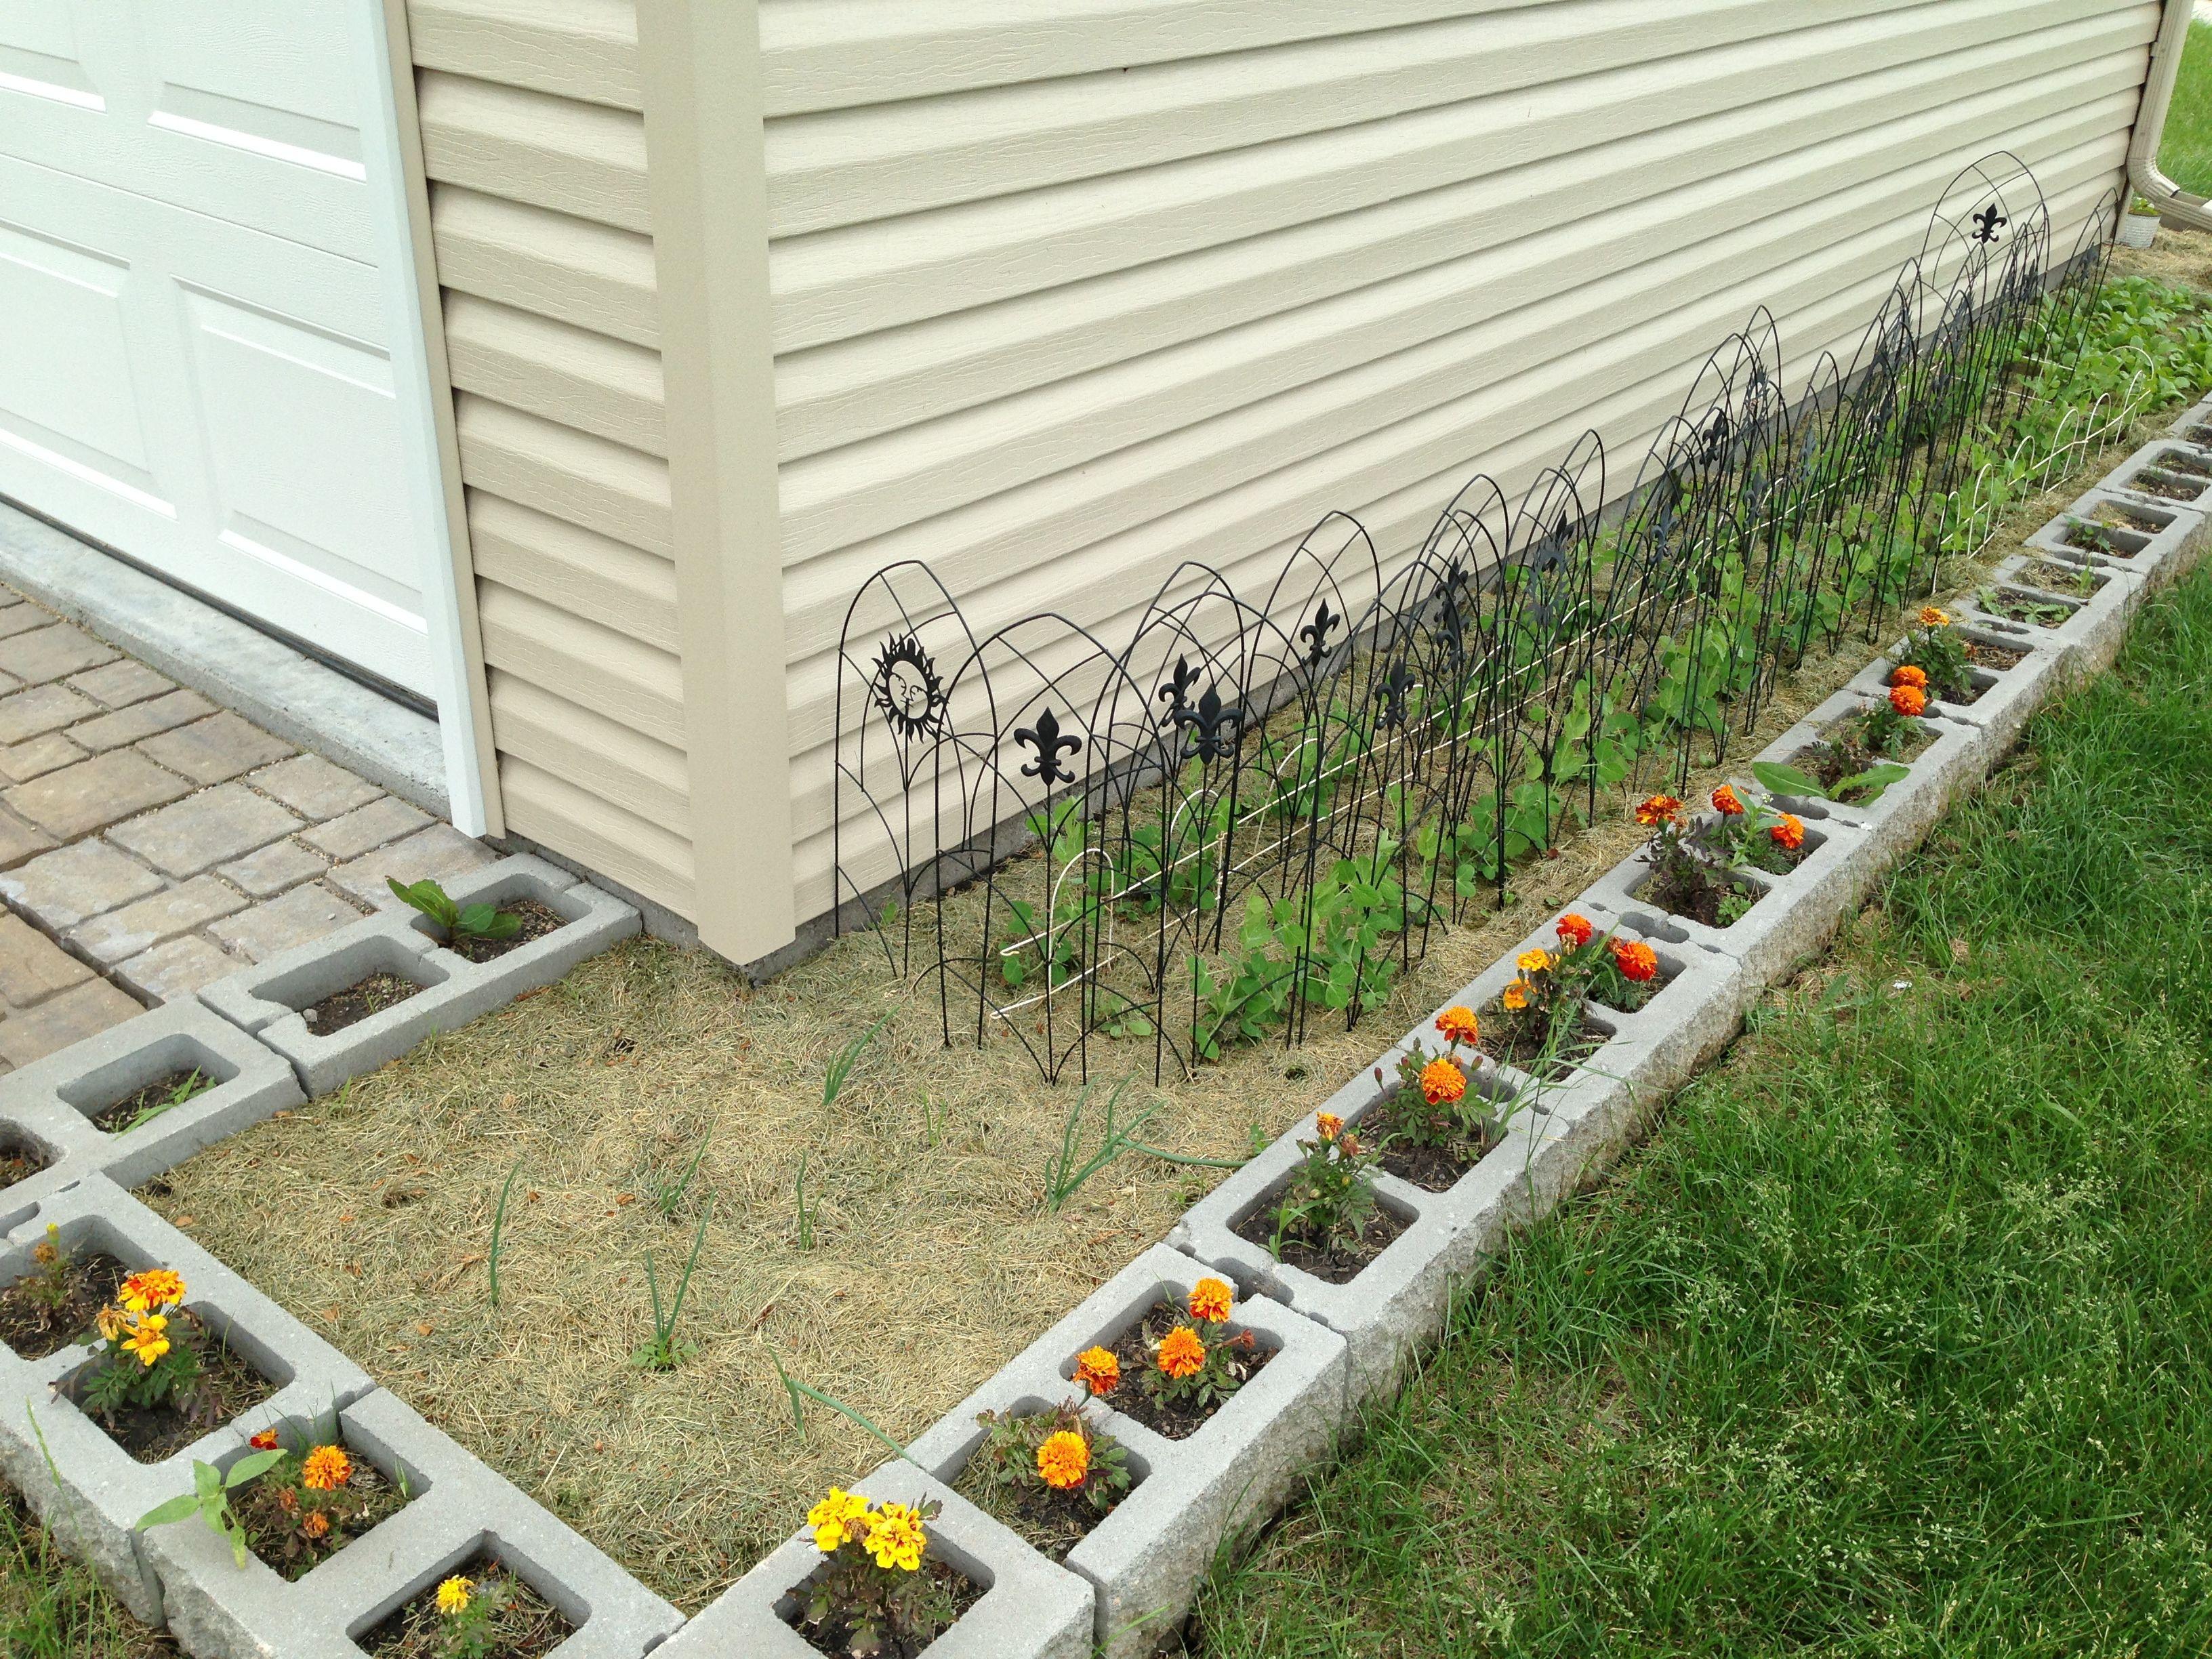 Cinder Block Garden GardenCinder BlocksEdging